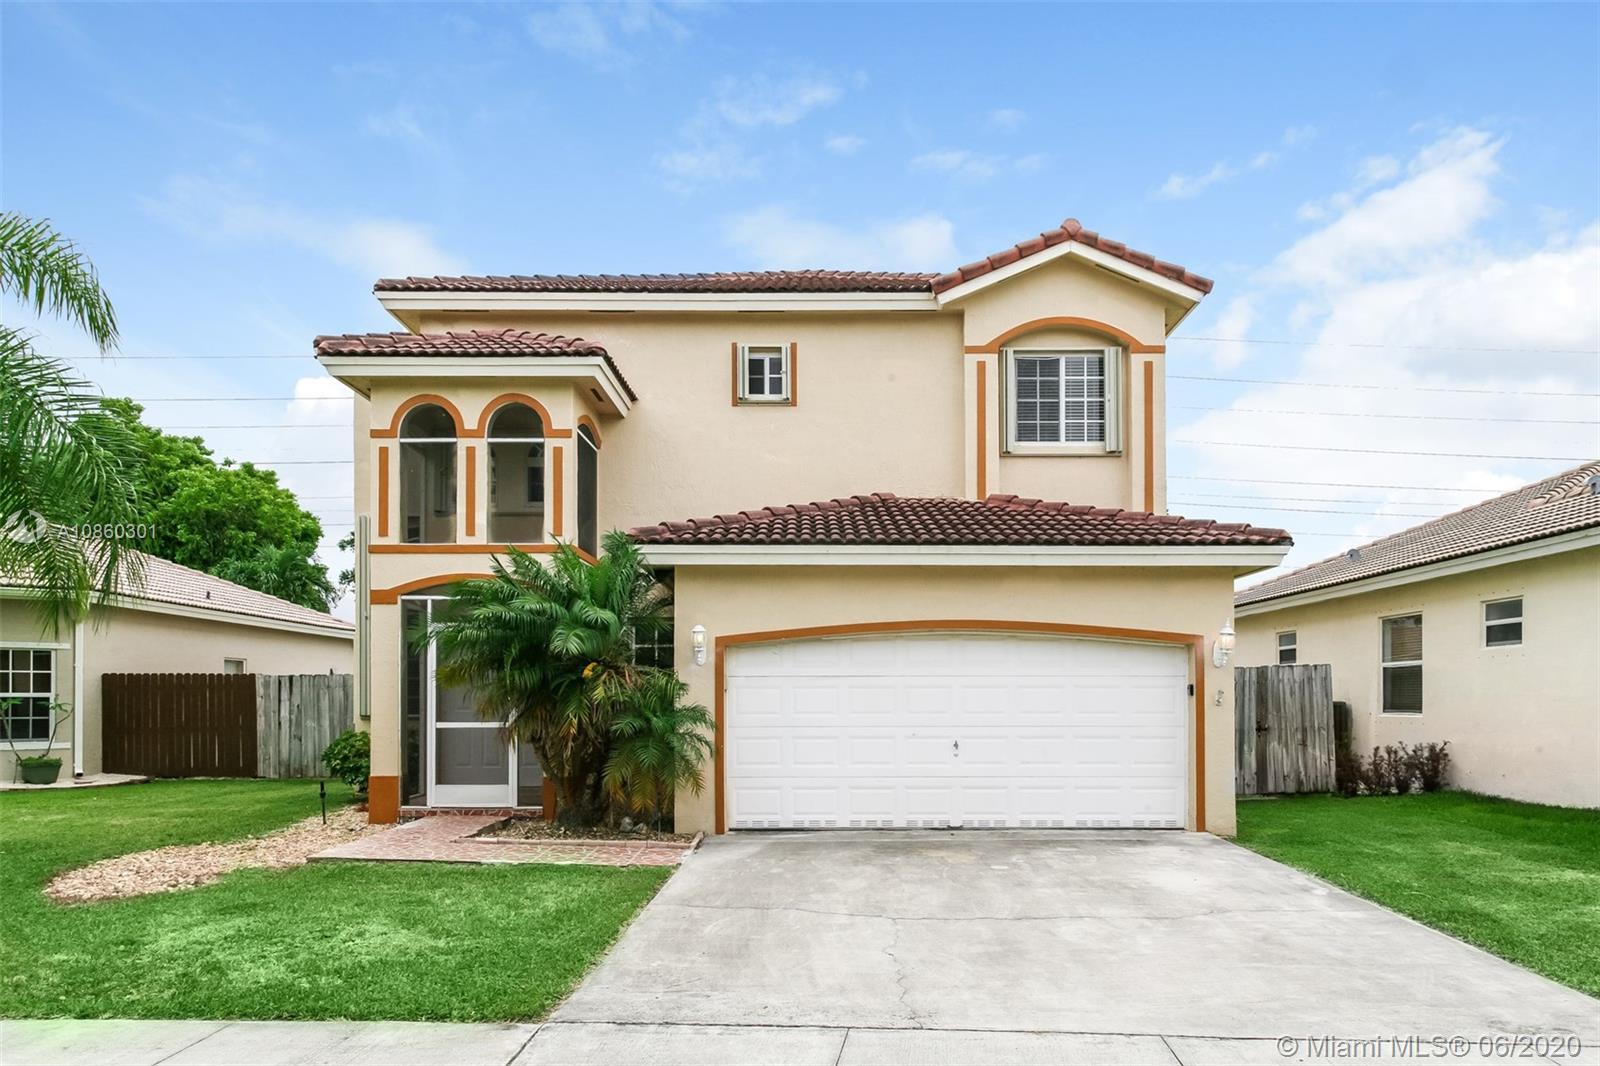 2870 Dunwoodie Pl, Homestead, FL 33035 - Homestead, FL real estate listing